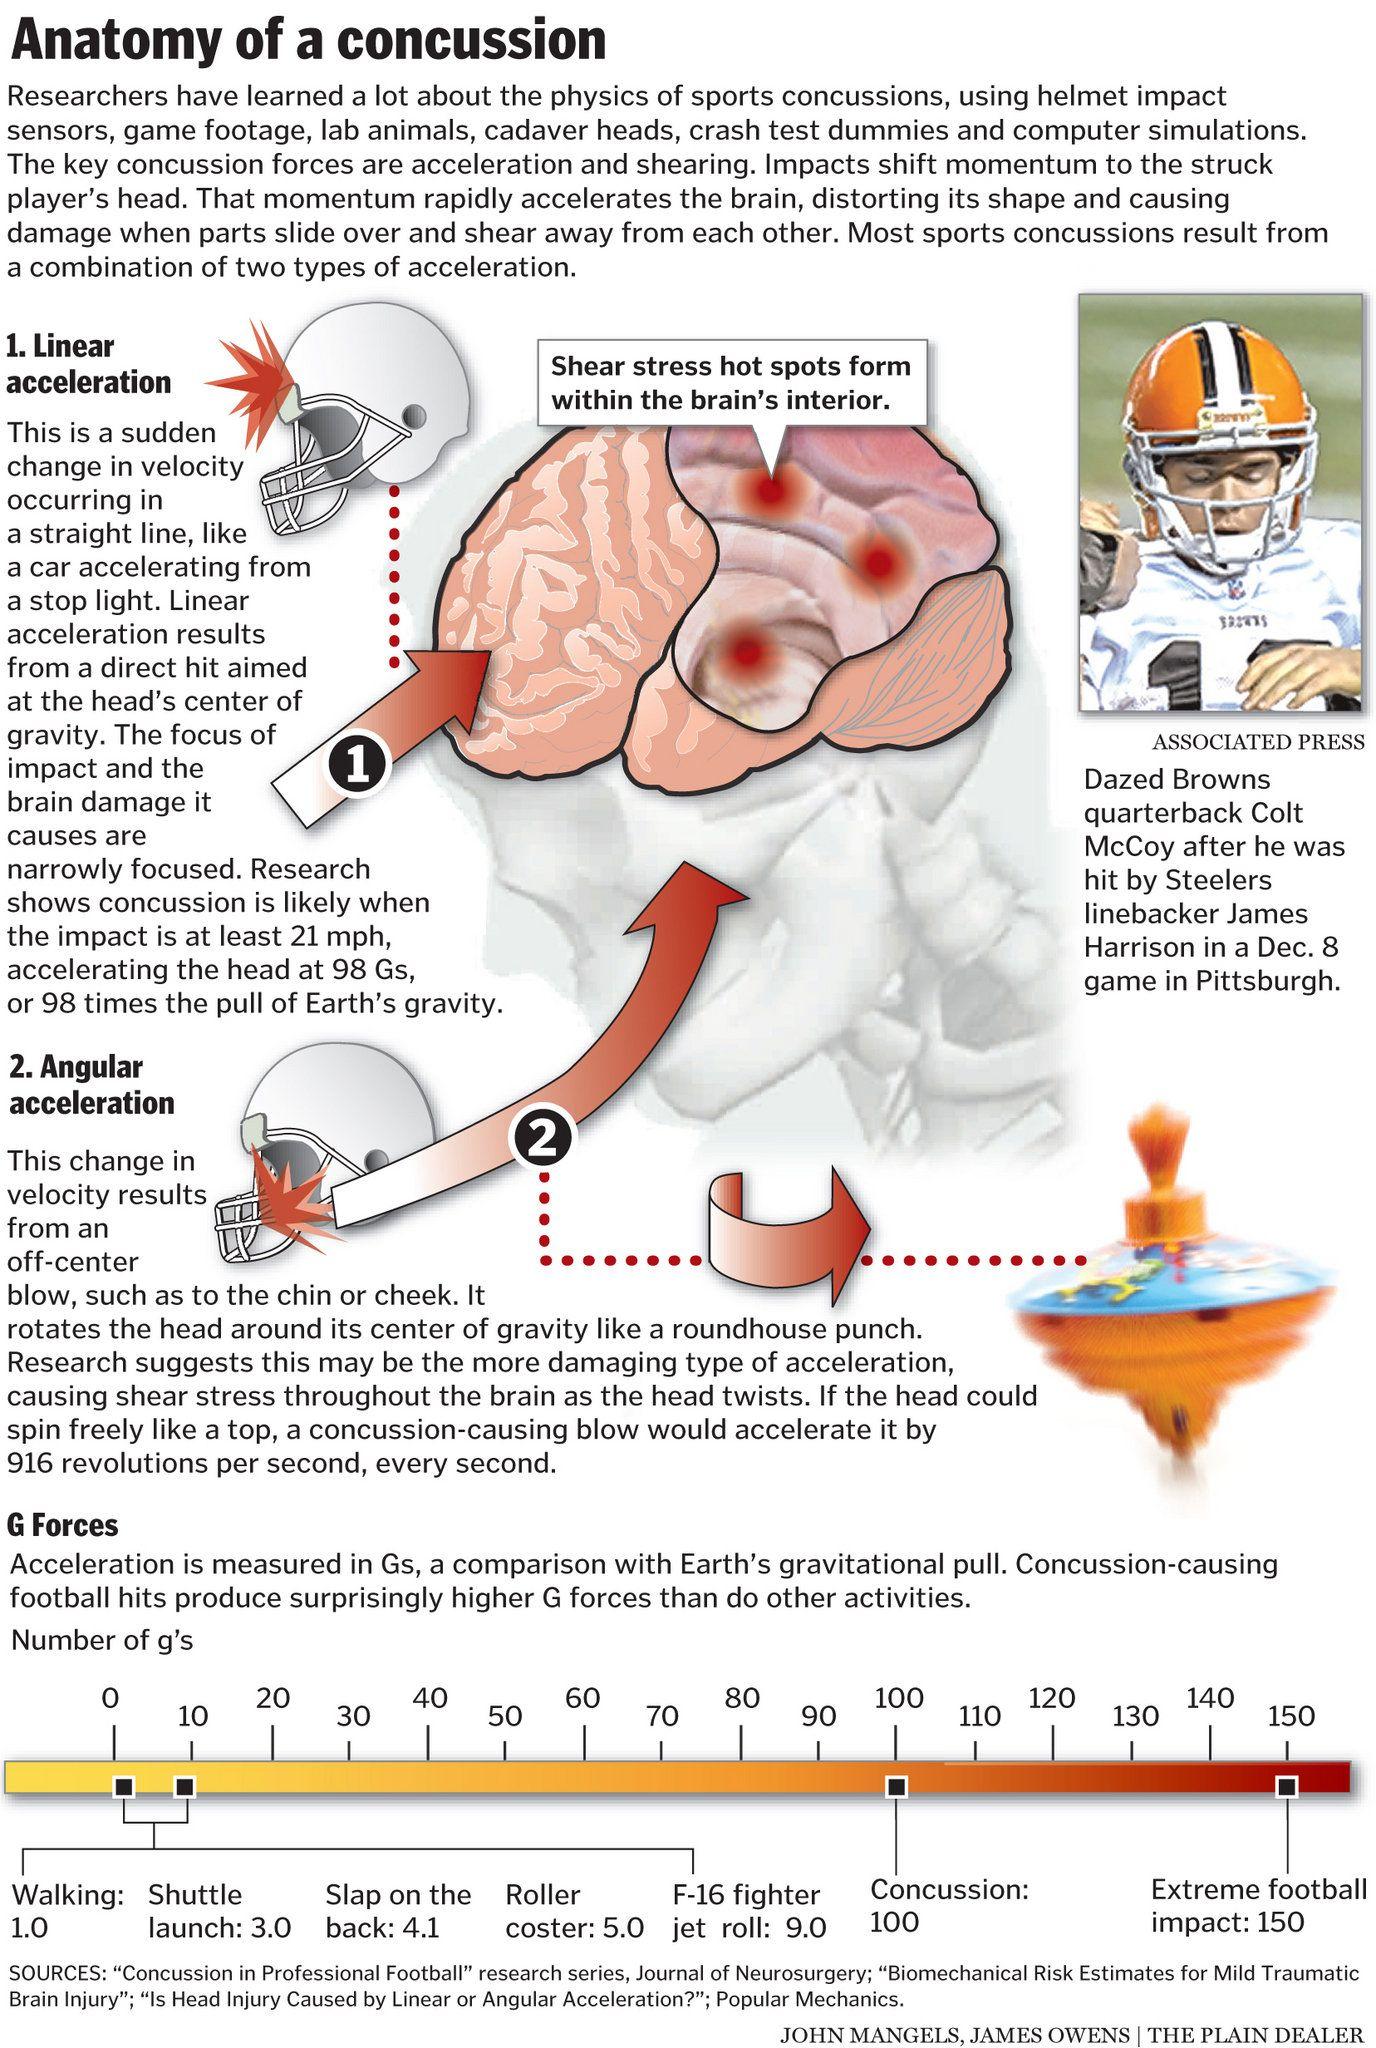 Anatomy of a concussion | medizina | Pinterest | Anatomy, Brain ...